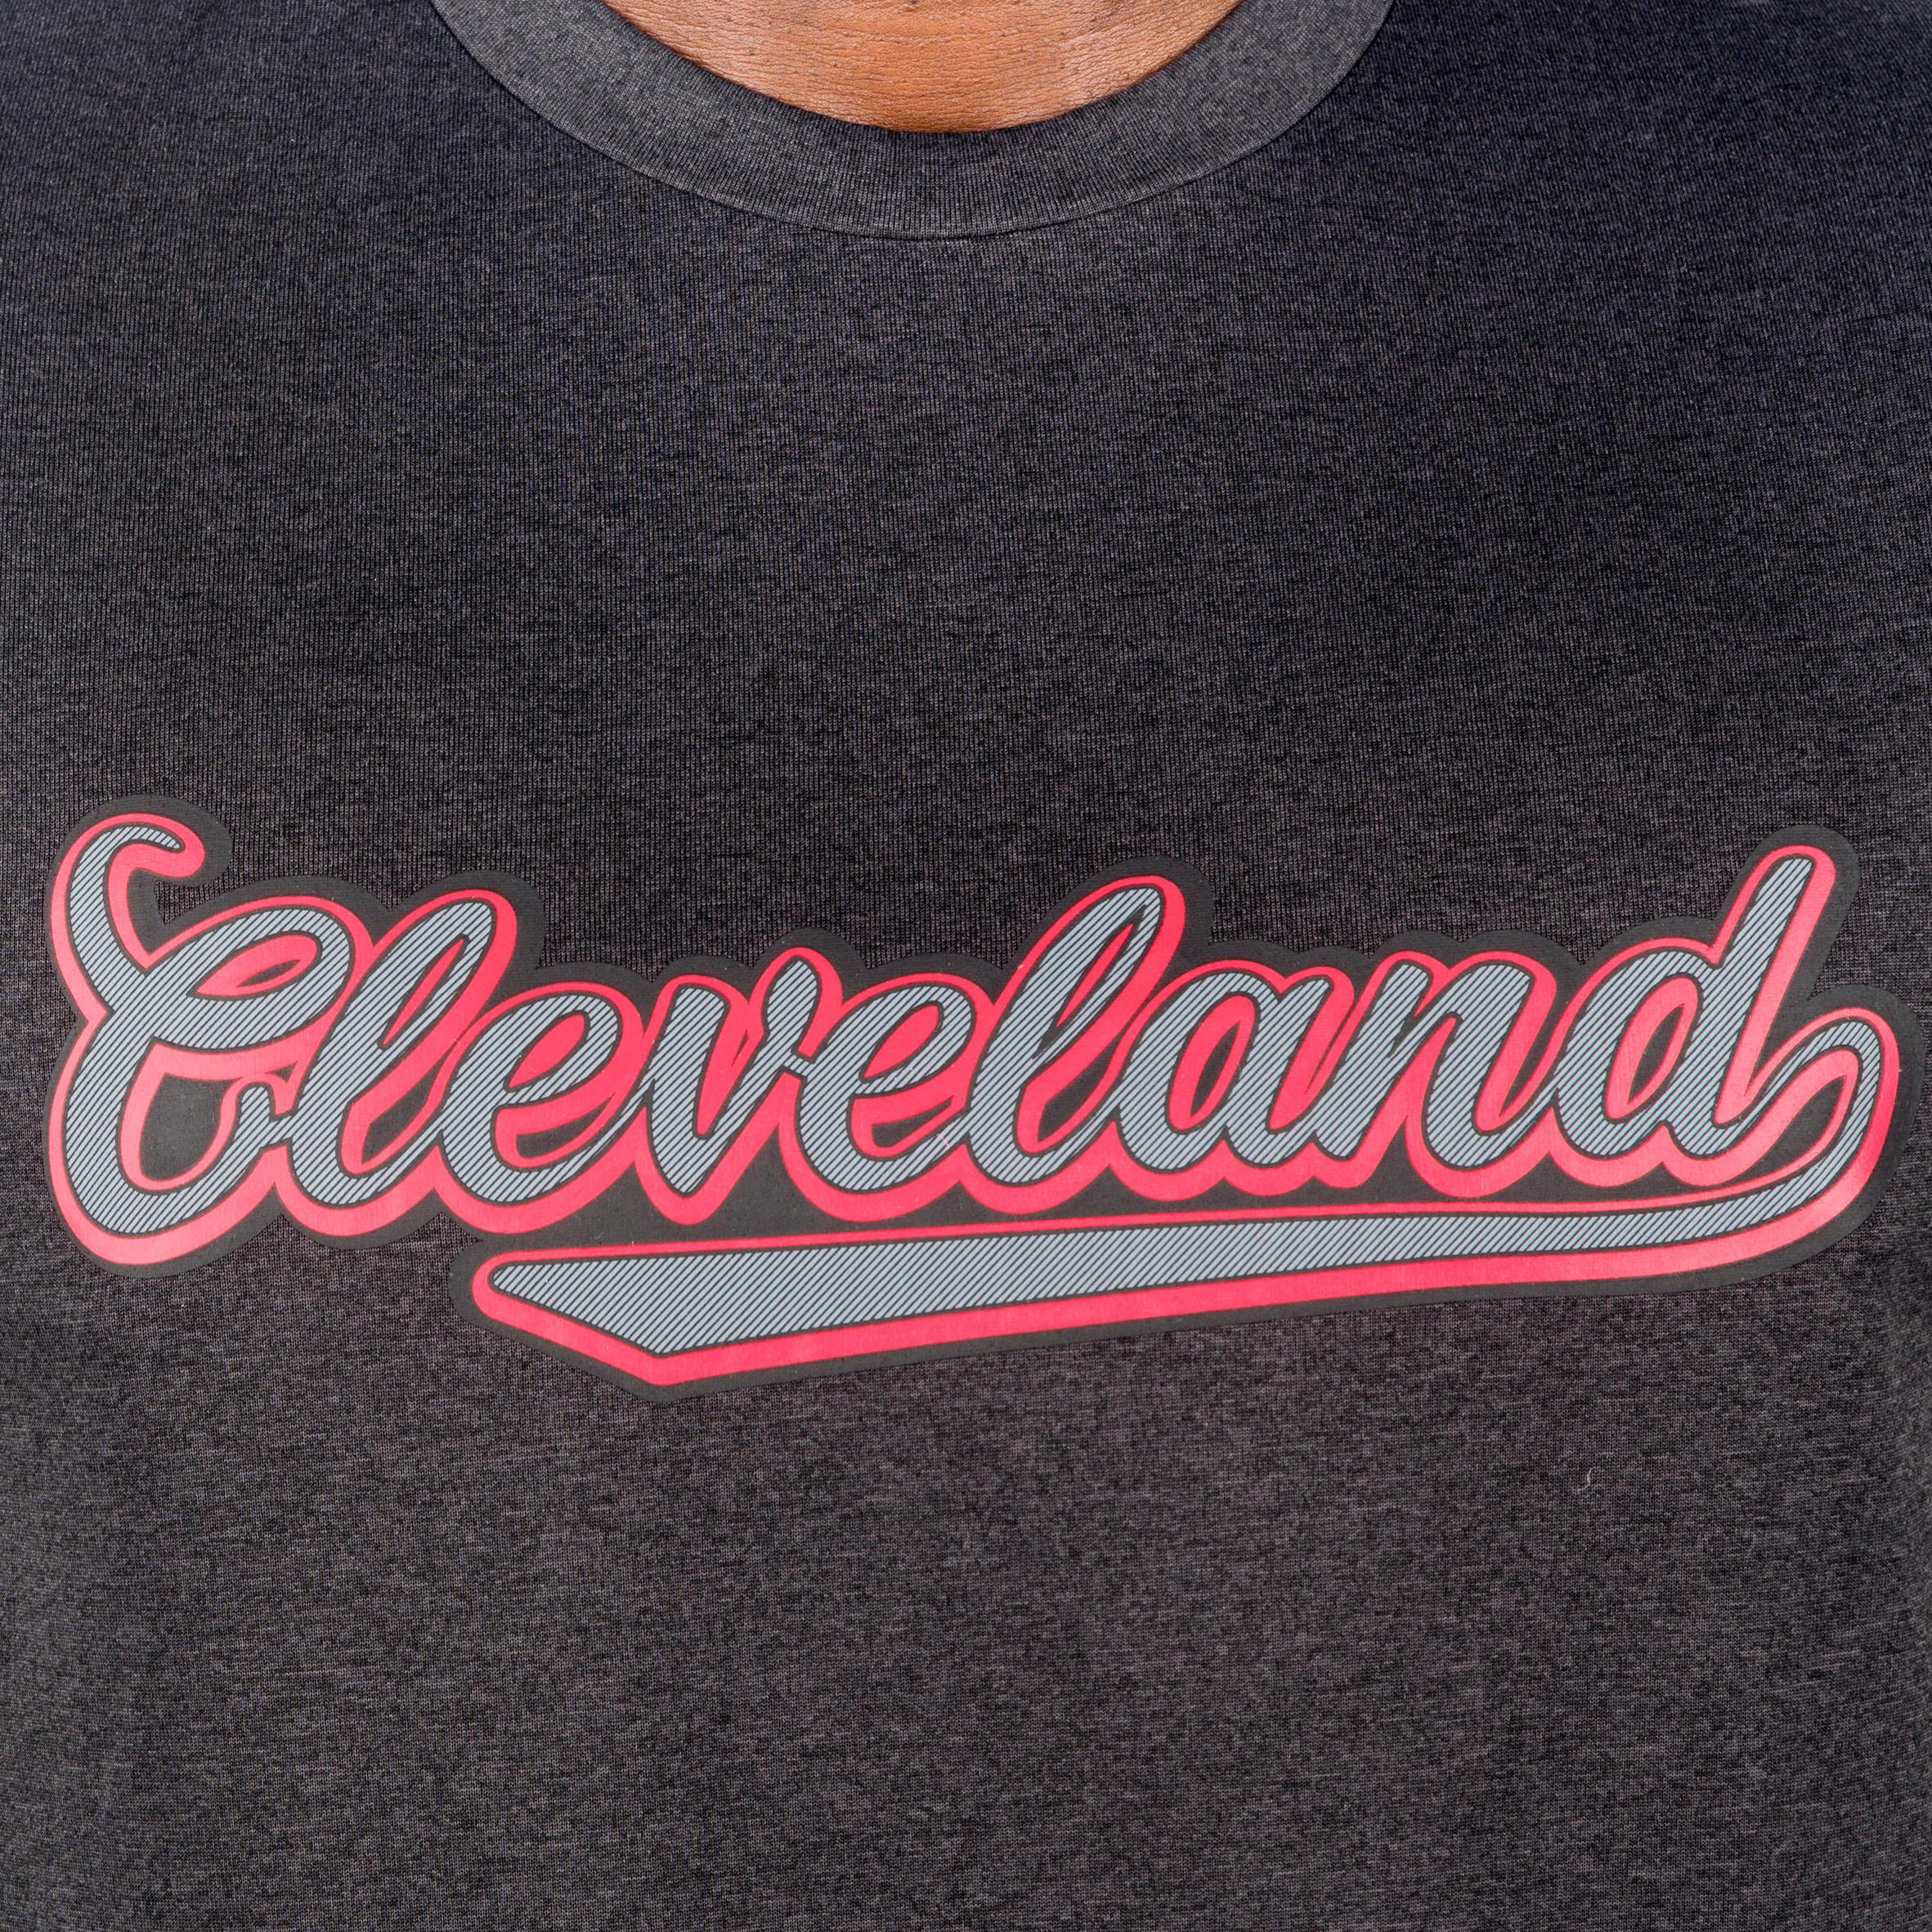 Fast Cleveland Beginner/Experienced Basketball T-Shirt - Black